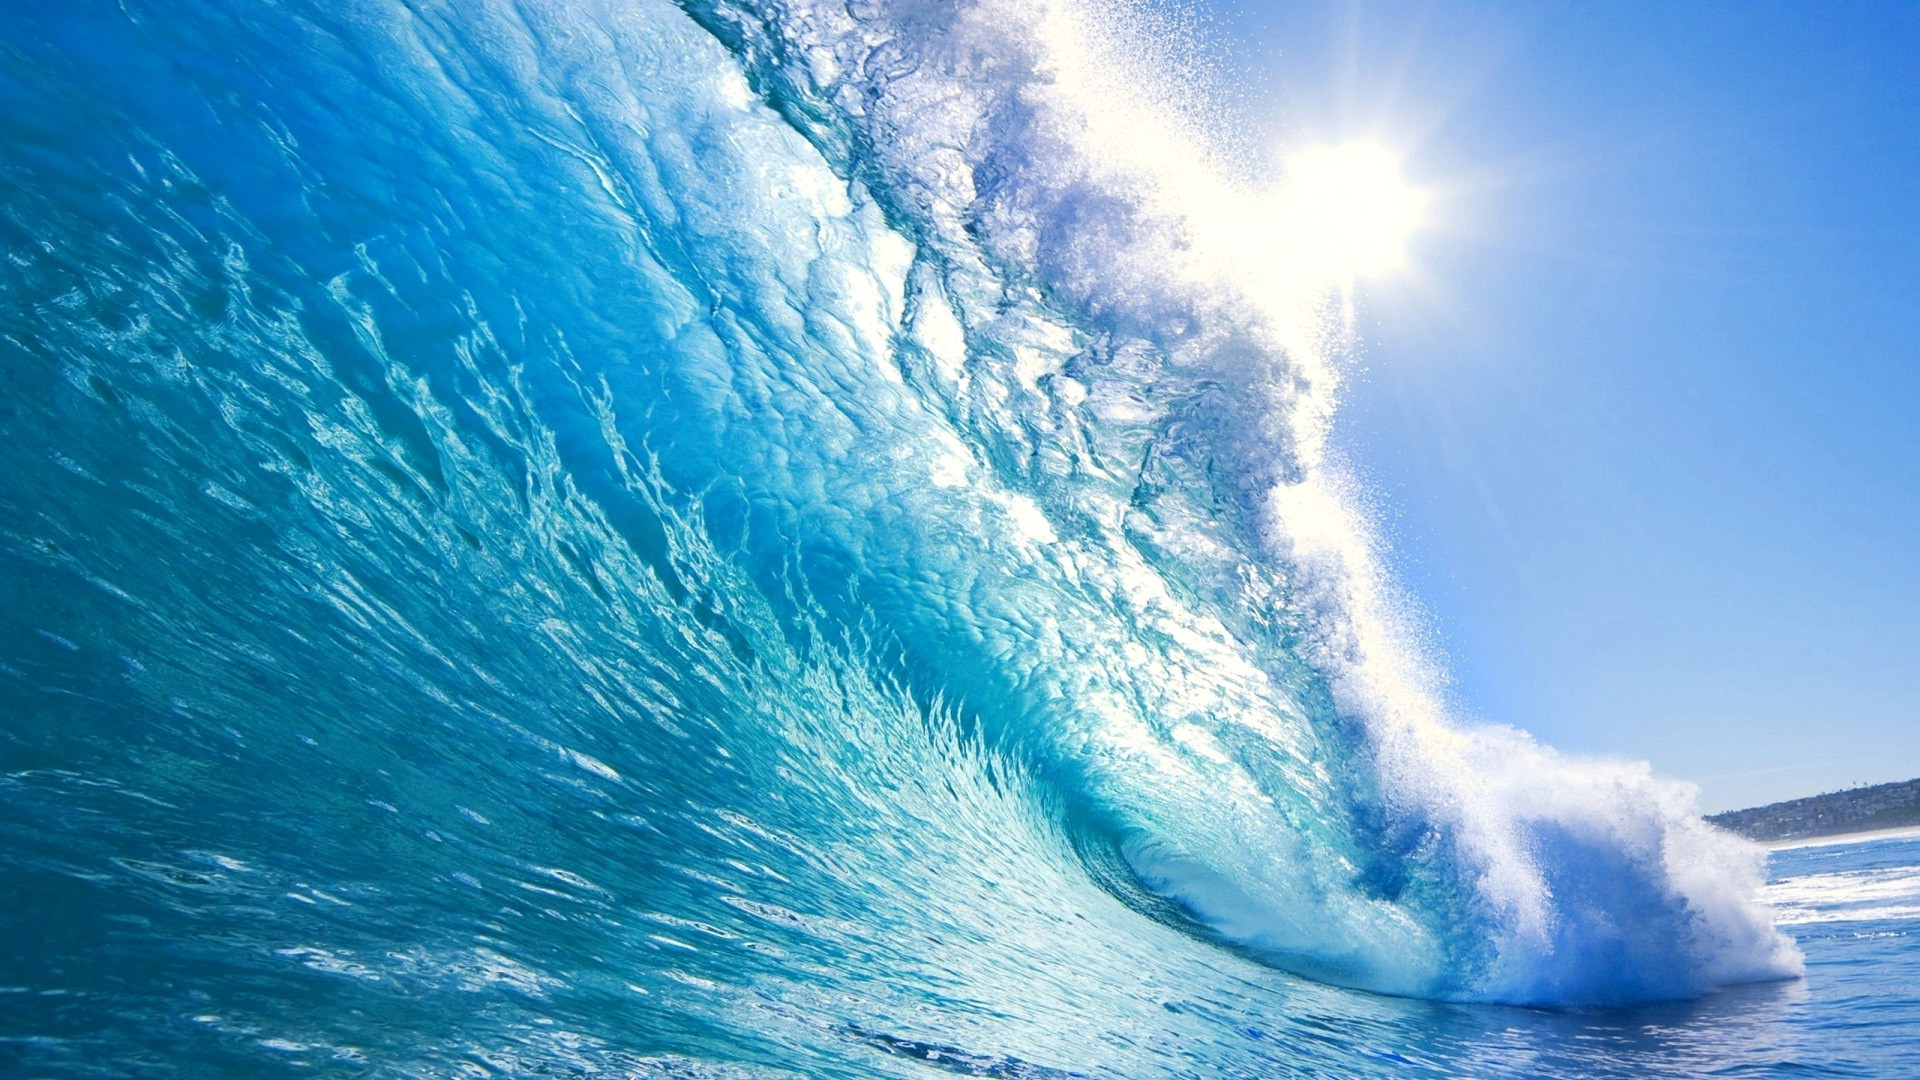 Ocean Waves Desktop Background Wallpaper HD Desktop Wallpapers HD 1920x1080